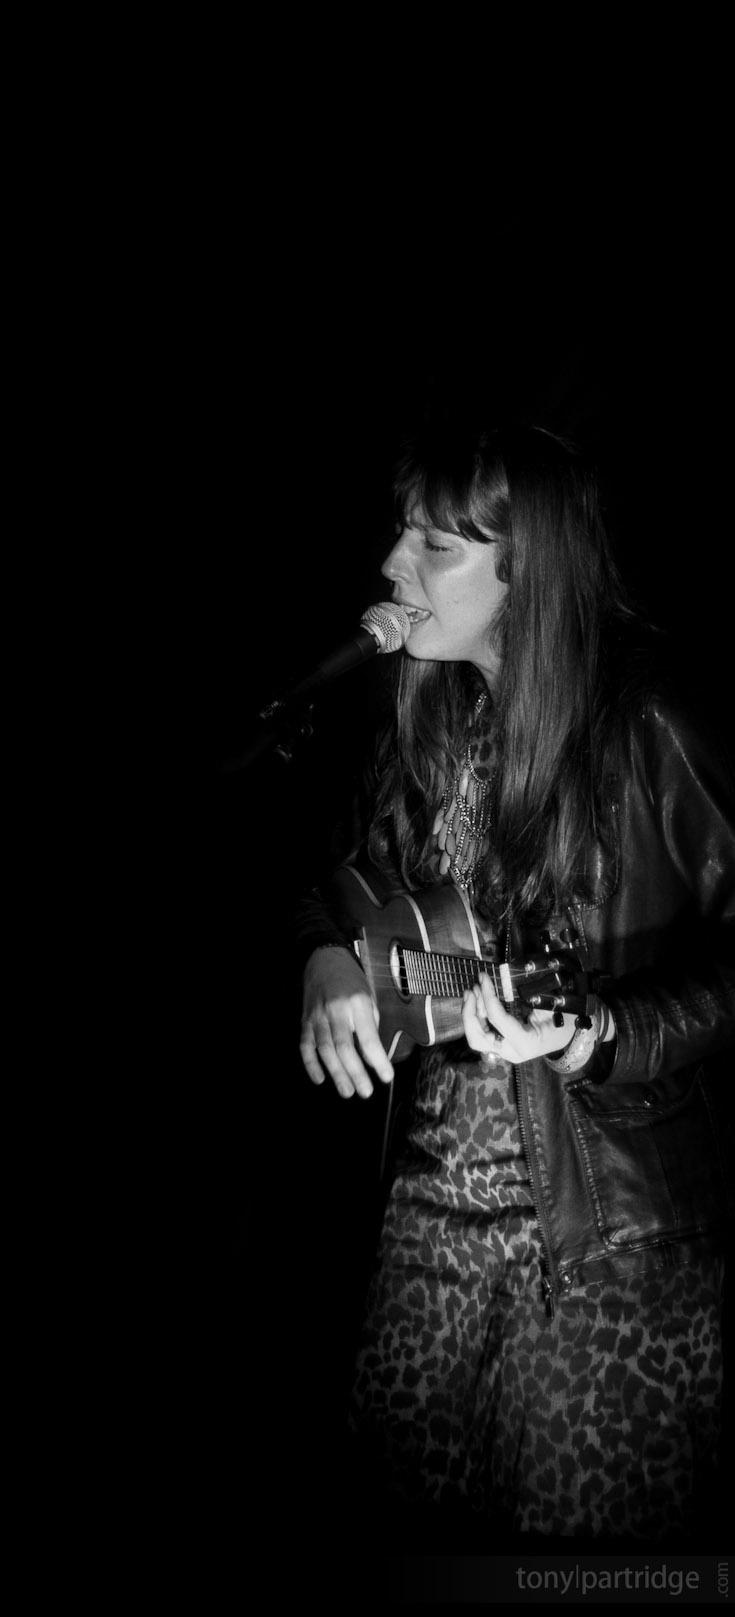 Andrea Soler performing at the Nimbin Bush Theatre #band #photography